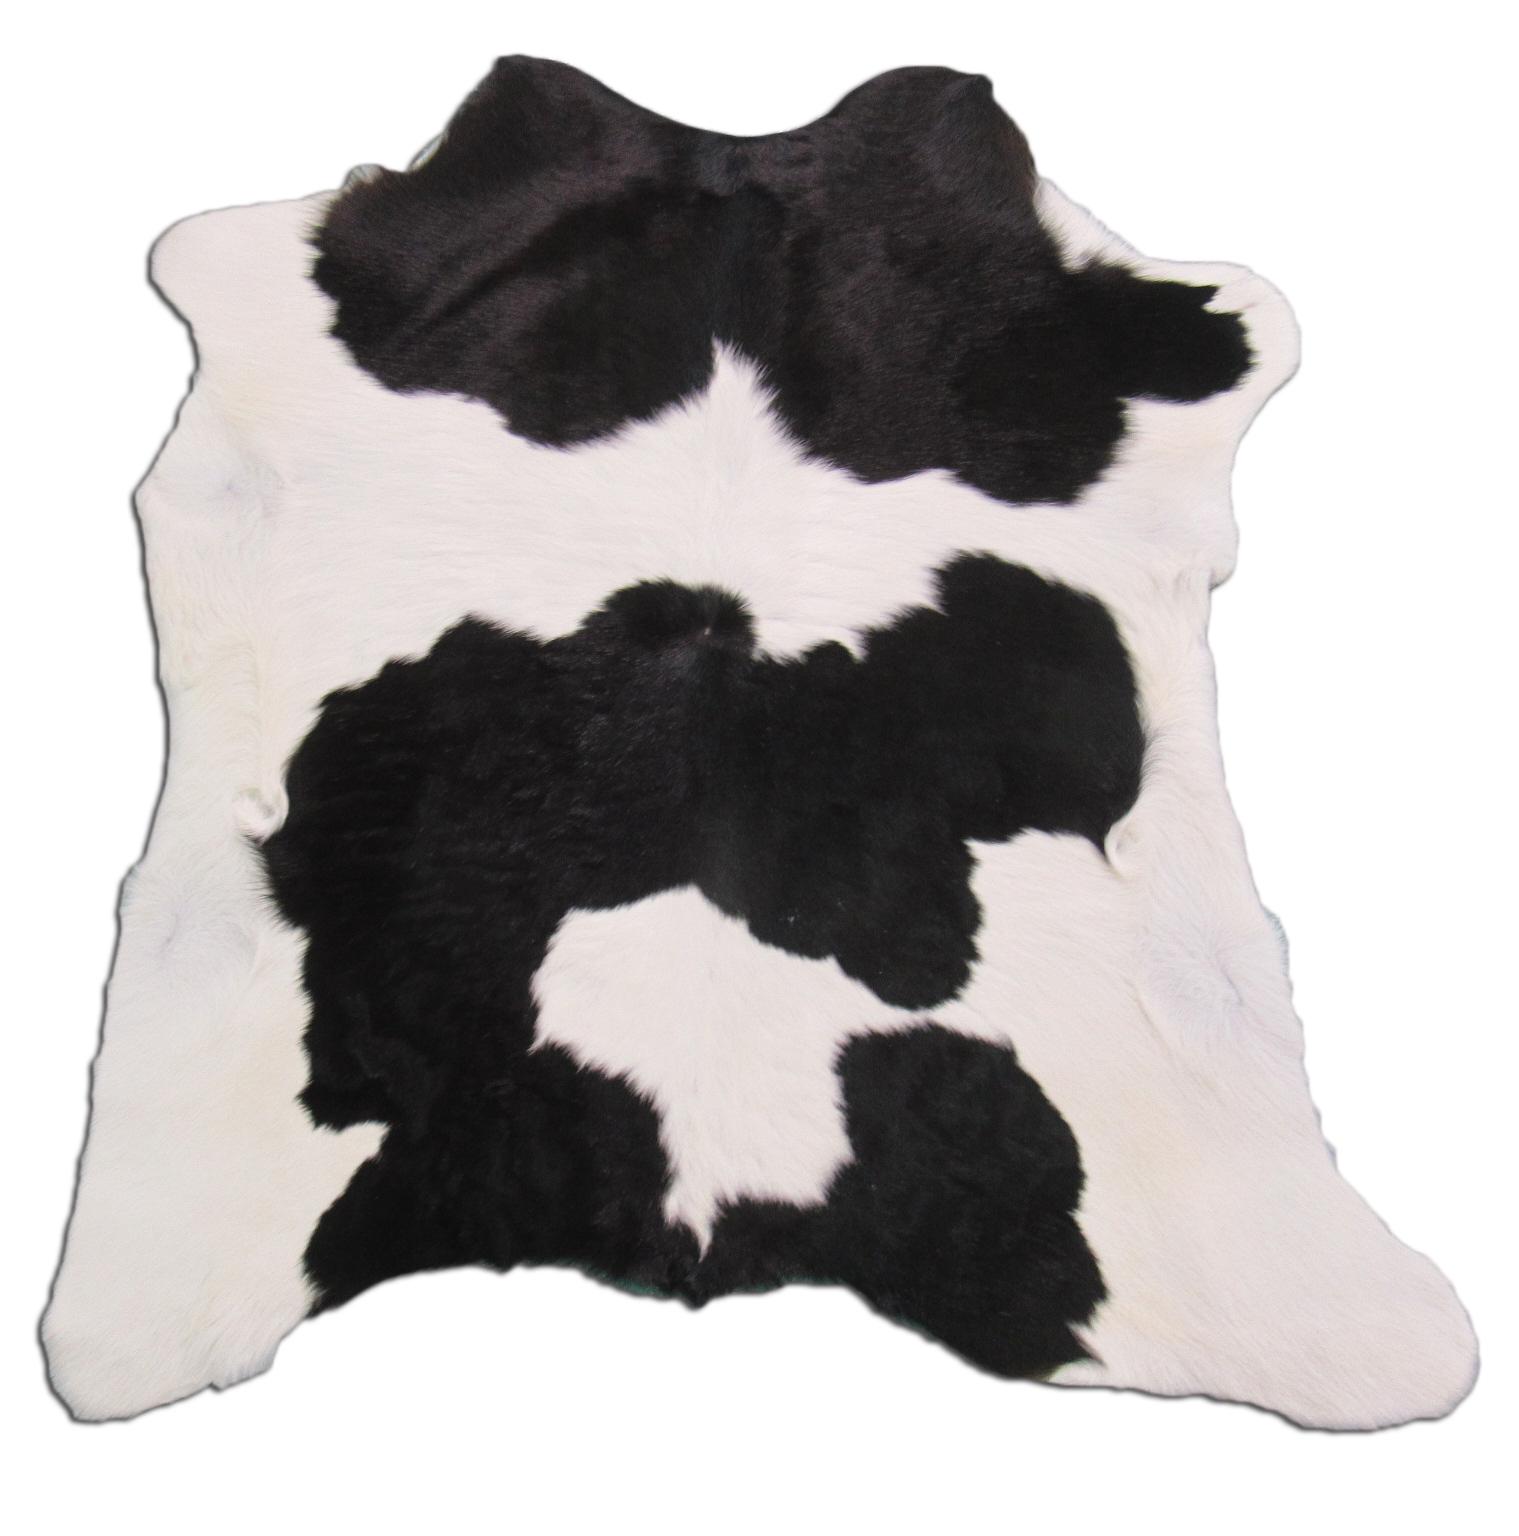 A-1161 Black & White Calf Skin Rug - Size: 35 inches X 31 inches